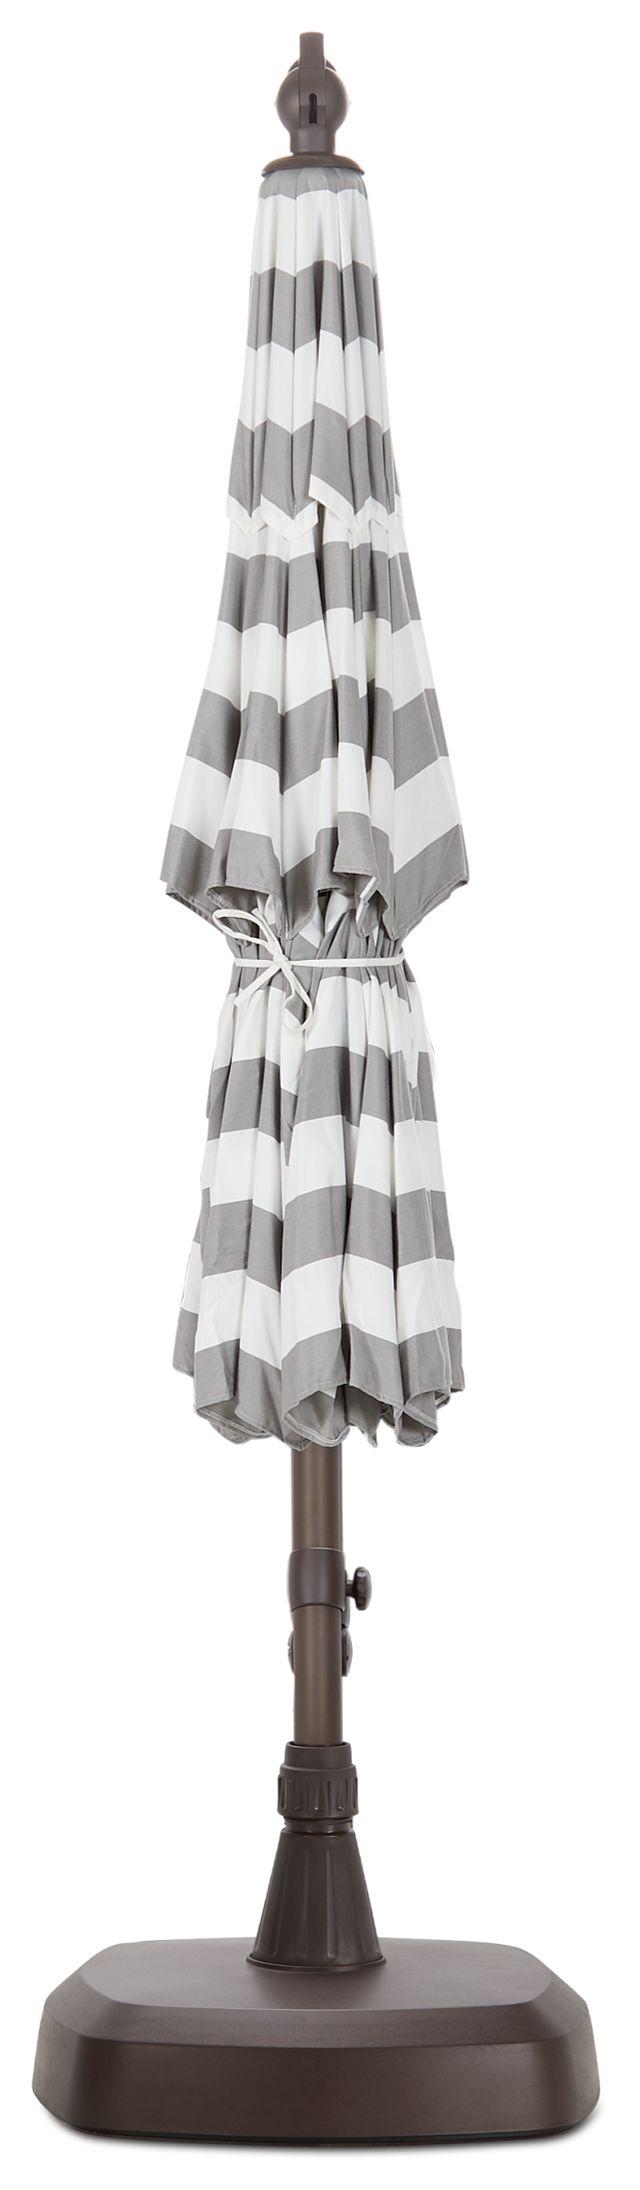 Cayman Gray Stripe Cantilever Umbrella Set (0)